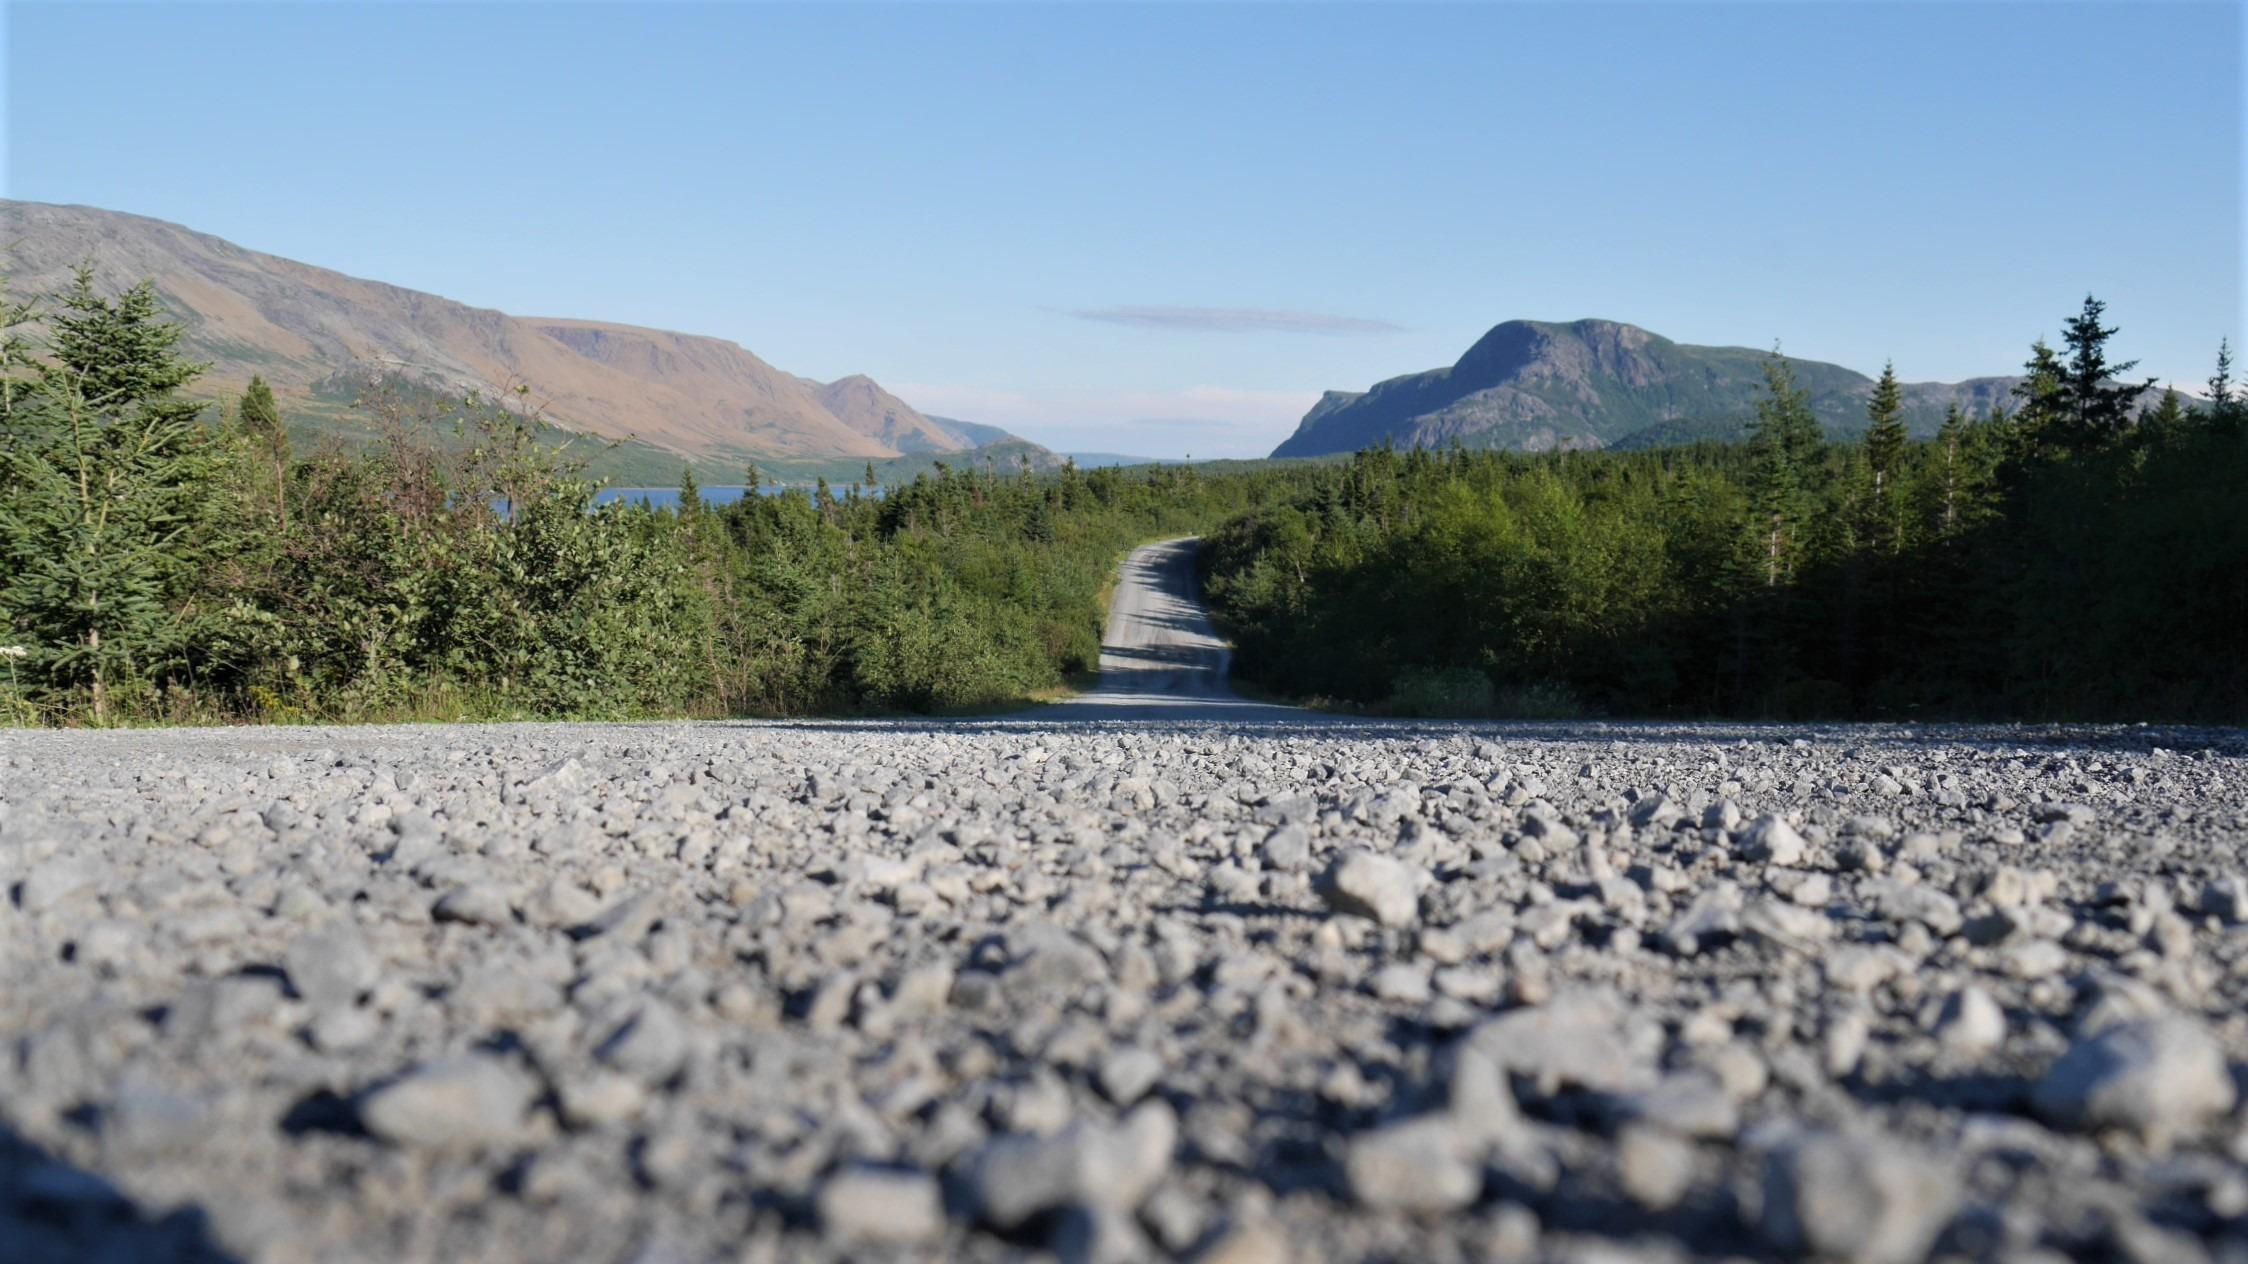 terre-neuve canada road-trip voyage blog arpenter le chemin